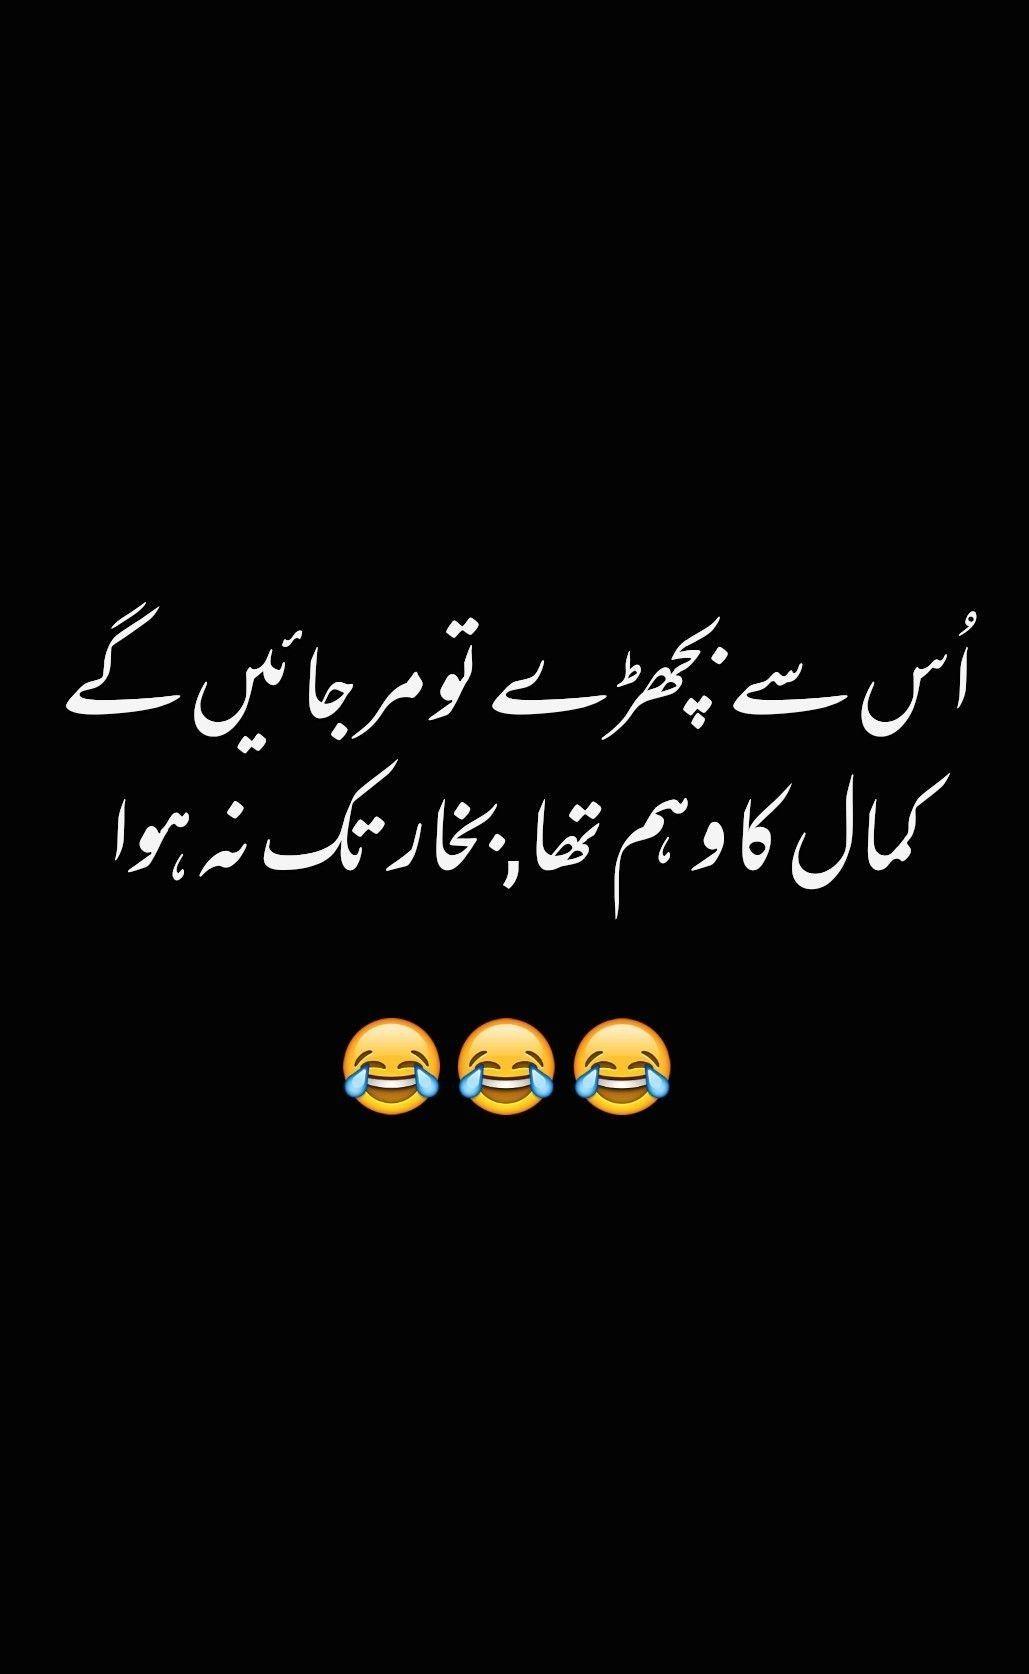 Pin By Barbie On Joke Funny Quotes In Urdu Urdu Funny Quotes Fun Quotes Funny